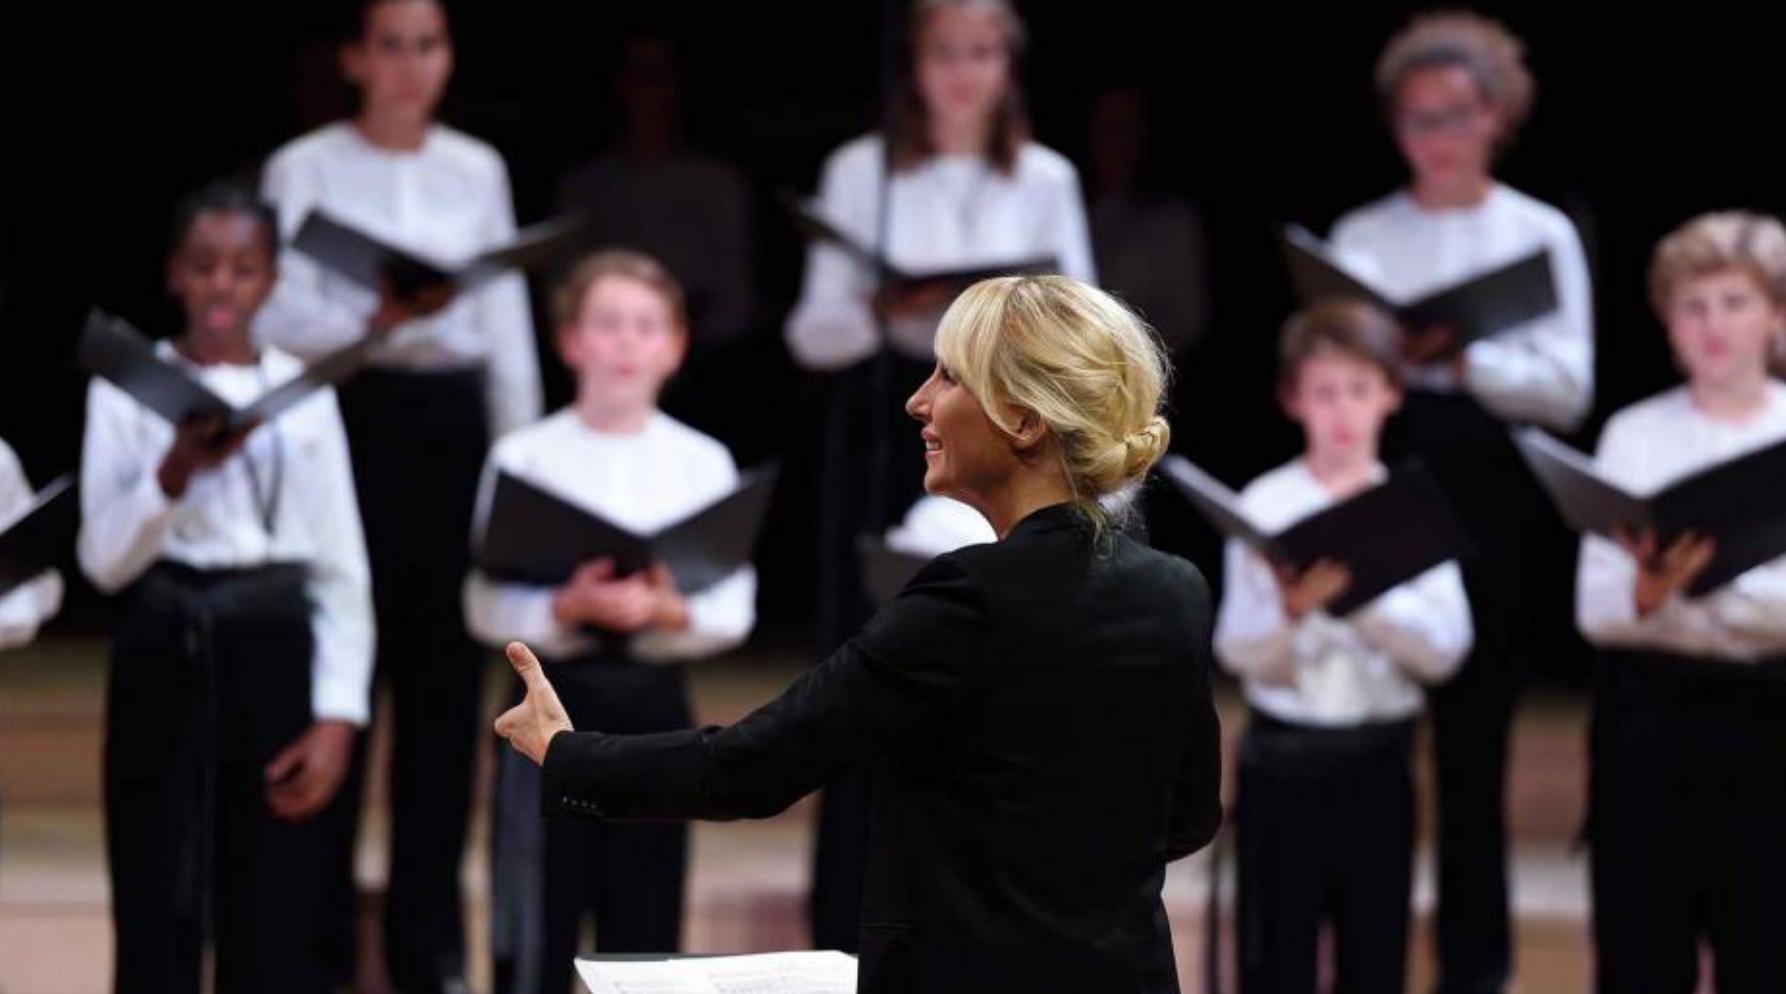 Sofi Jeannin dirige la Maîtrise de Radio France © Christophe Abramowitz / Radio France